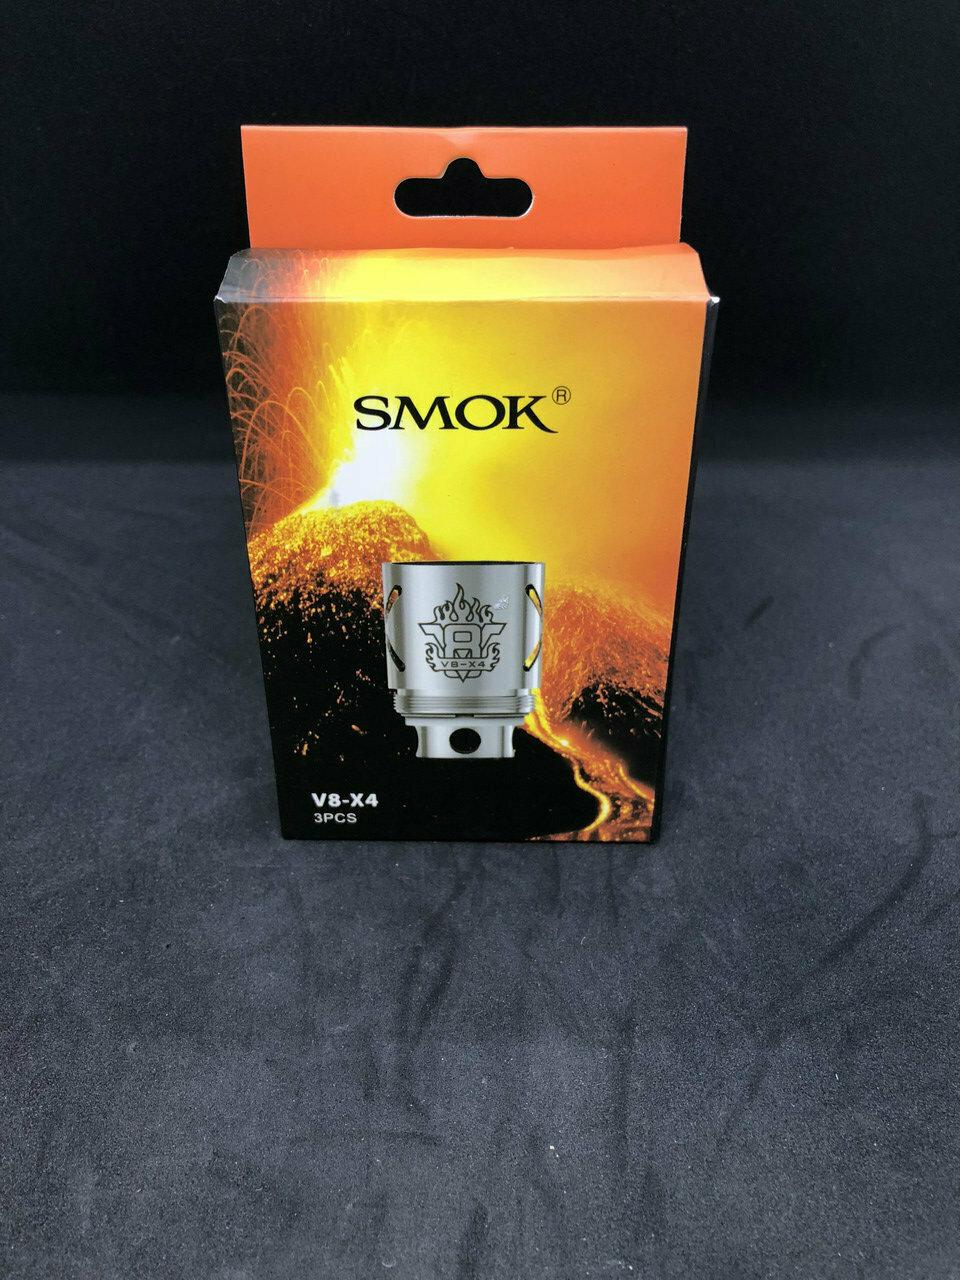 Smok TFV8 Coils (single)